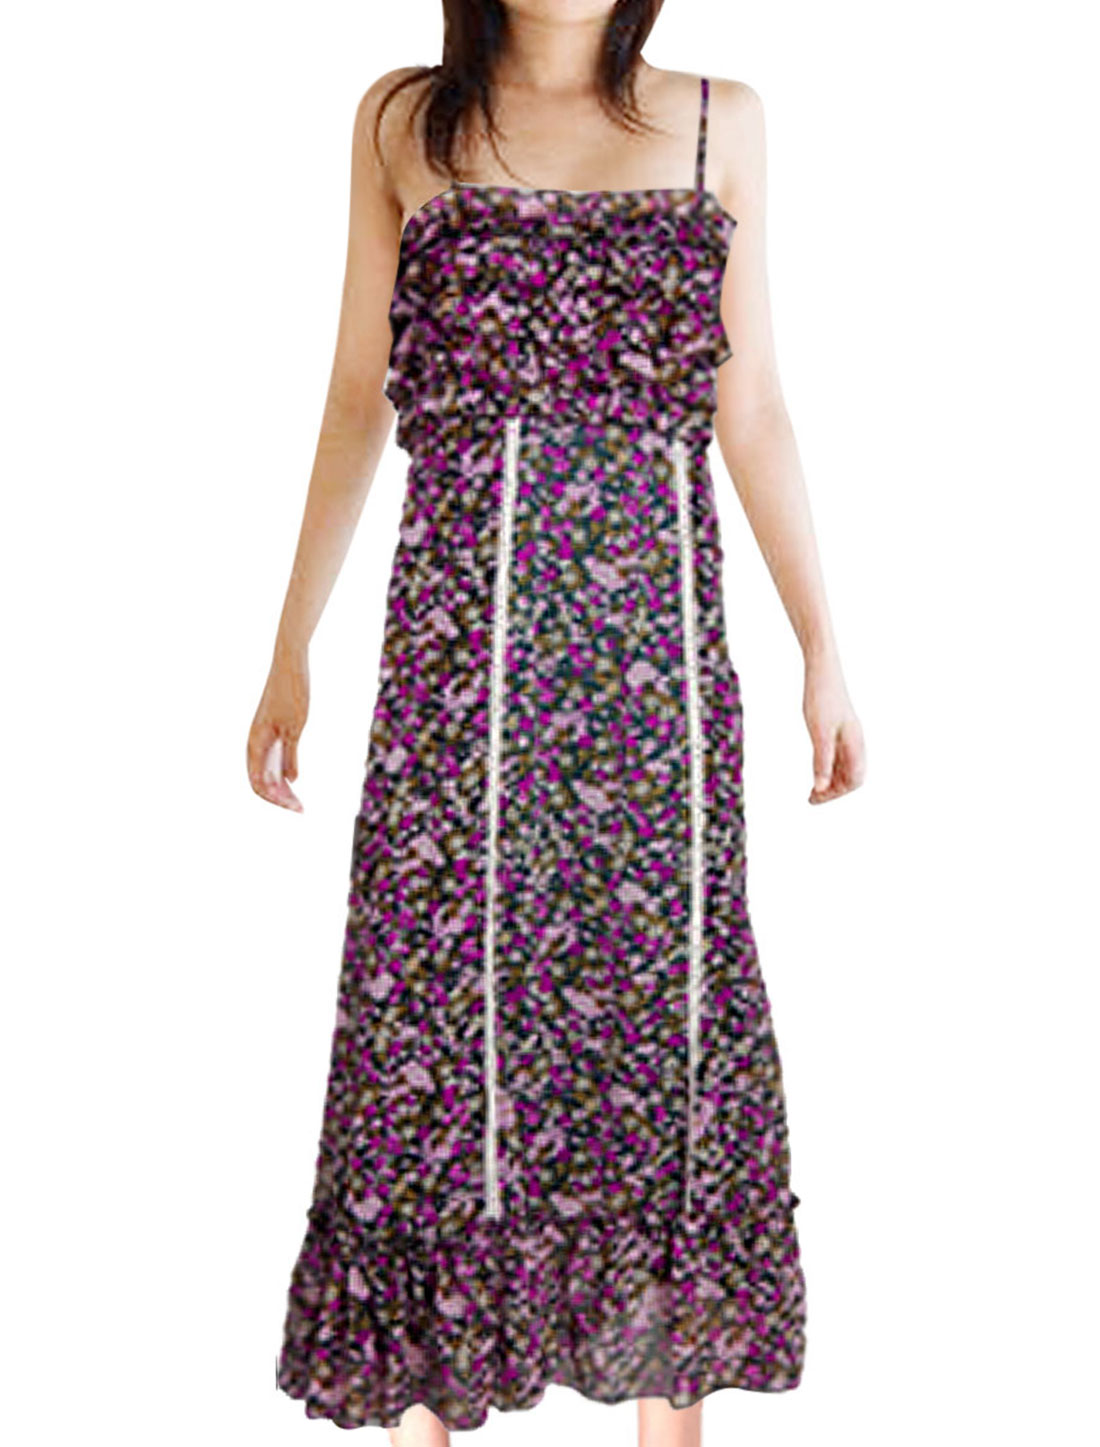 Ladies Floral Printed Sliding Strap Long Spaghetti Dress XS